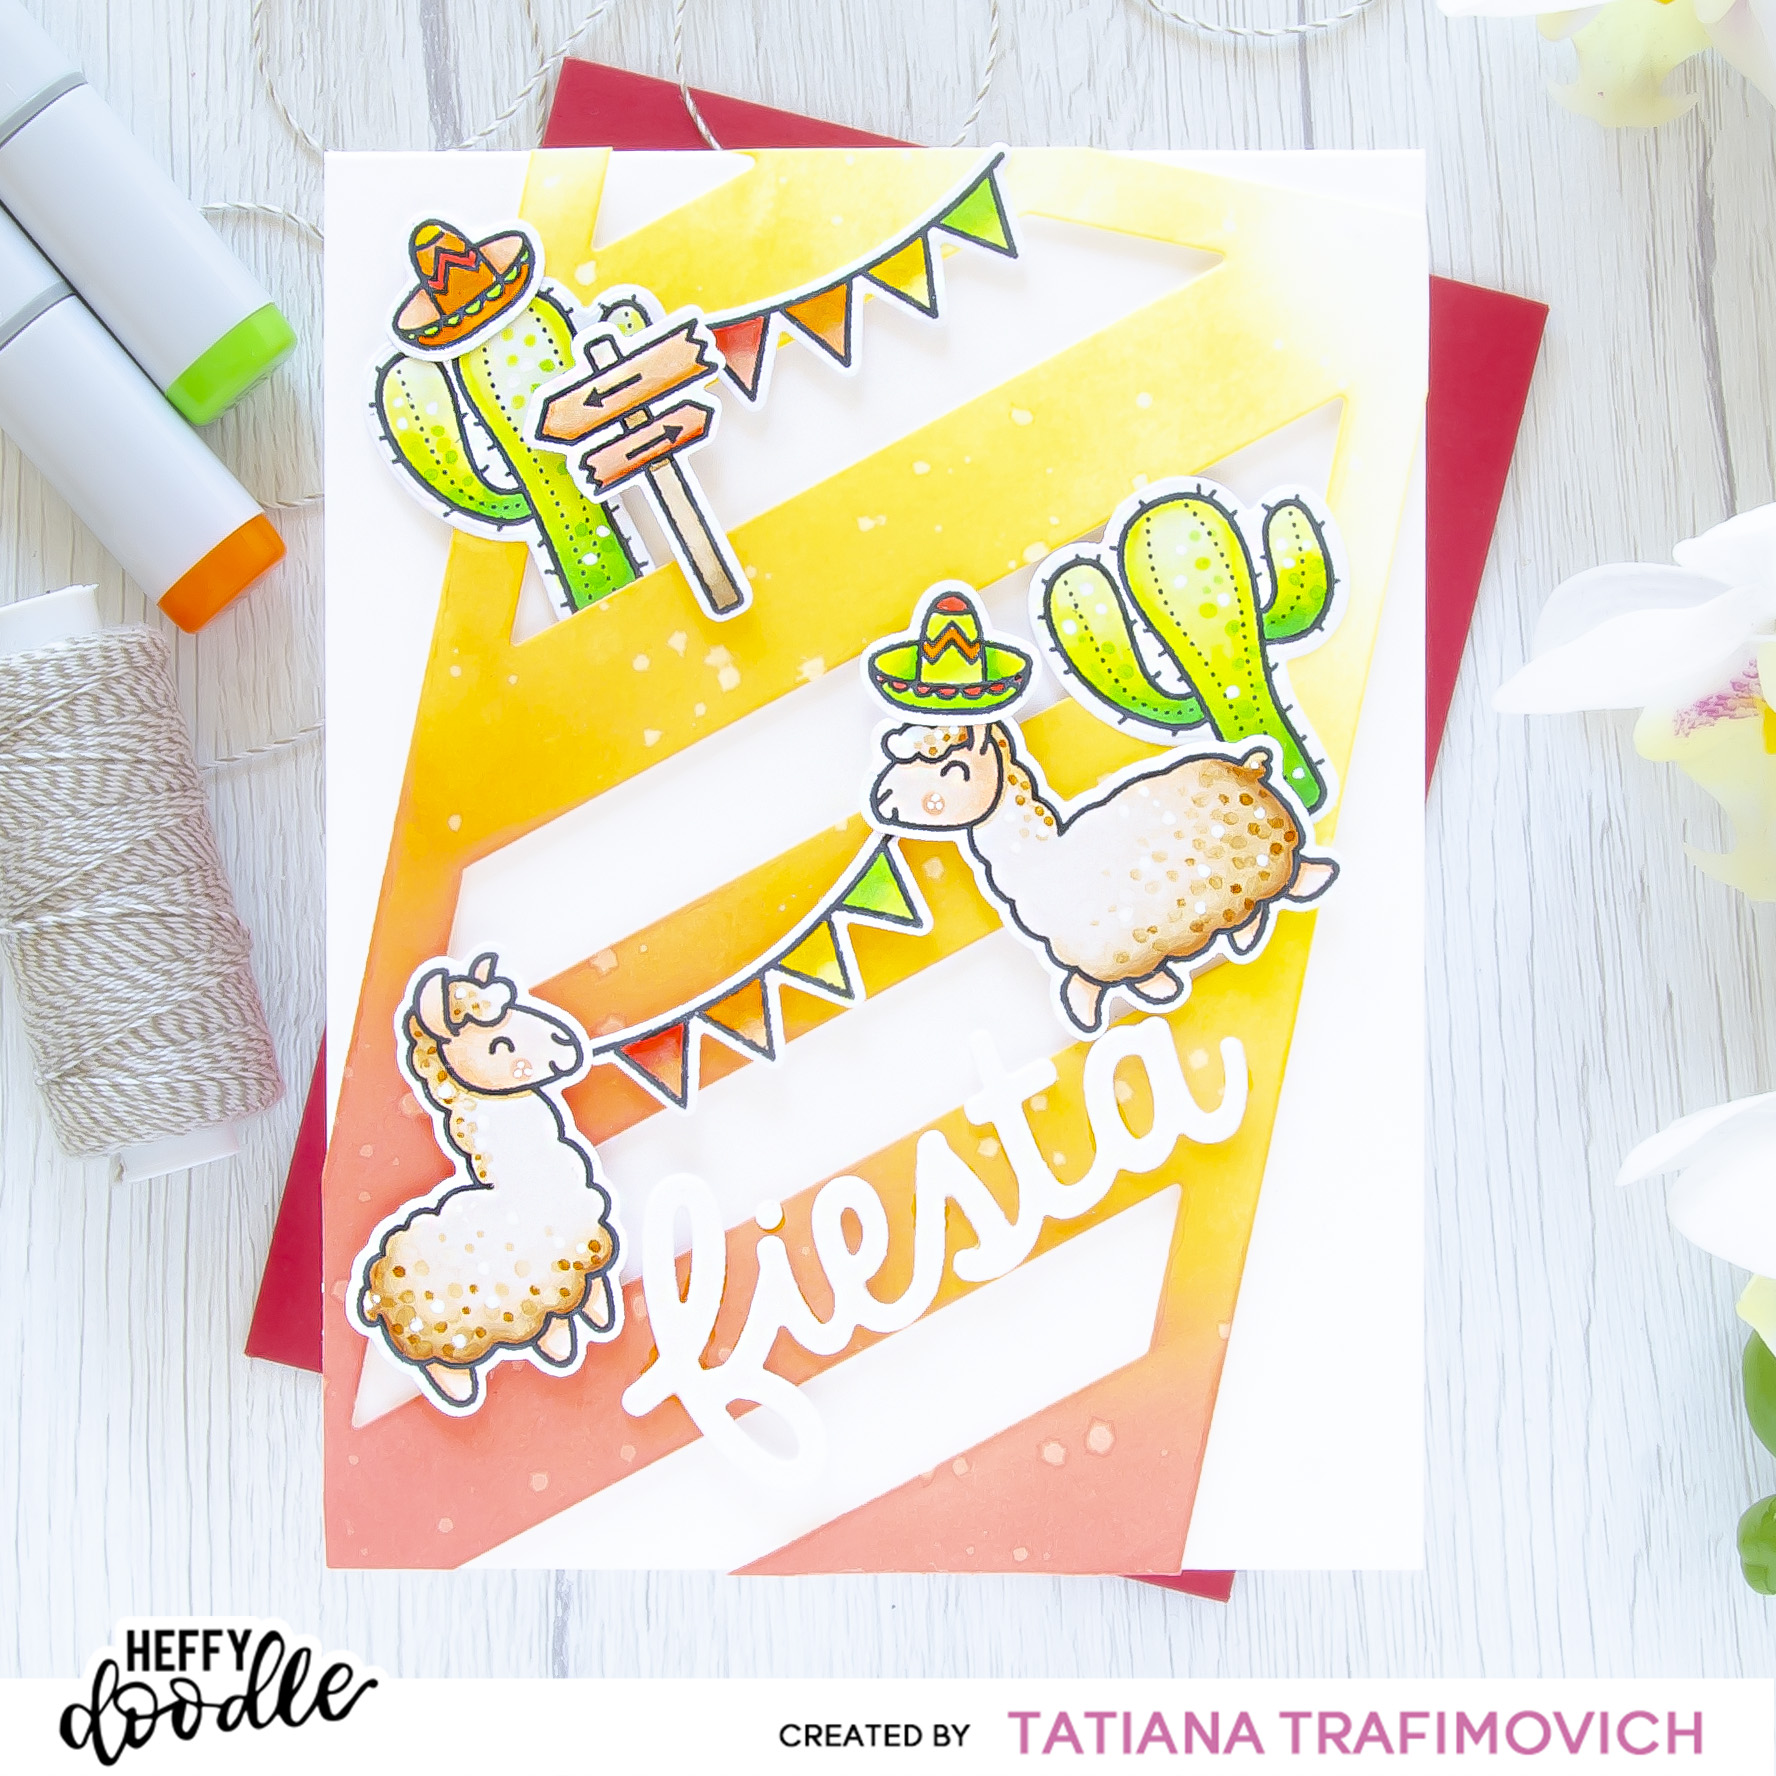 Fiesta #handmade card by Tatiana Trafimovich #tatianacraftandart - Llamazing Llamas Stamp Set by Heffy Doodle #heffydoodle